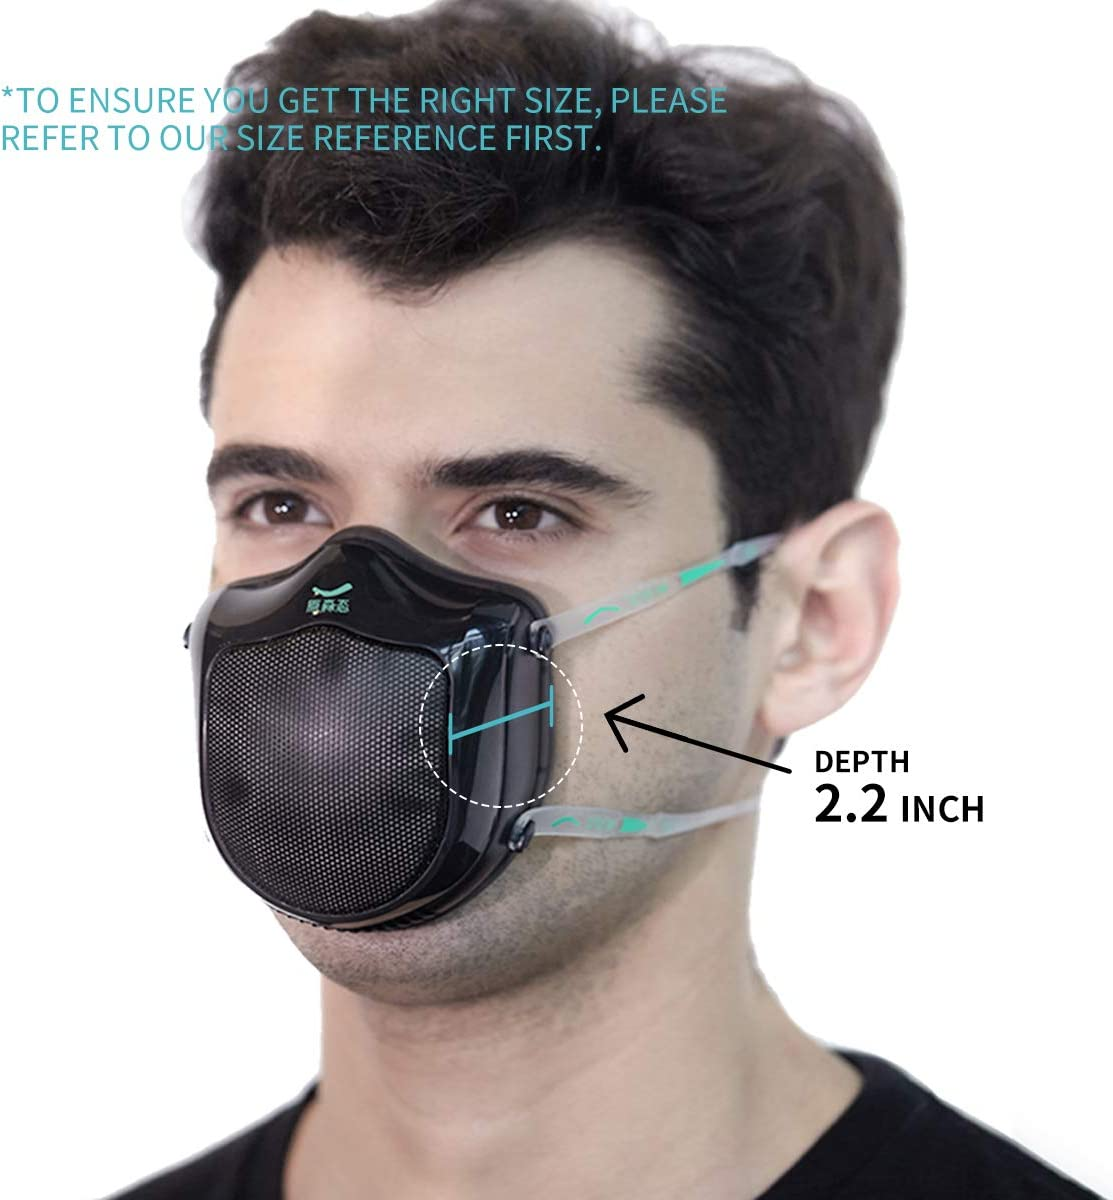 Mascarilla Xiaomi Q5S antipolución filtro de carbón activado, máscara automática de purificación de aire fresco a prueba de polvo para alergia al polen, polvo, gas de escape